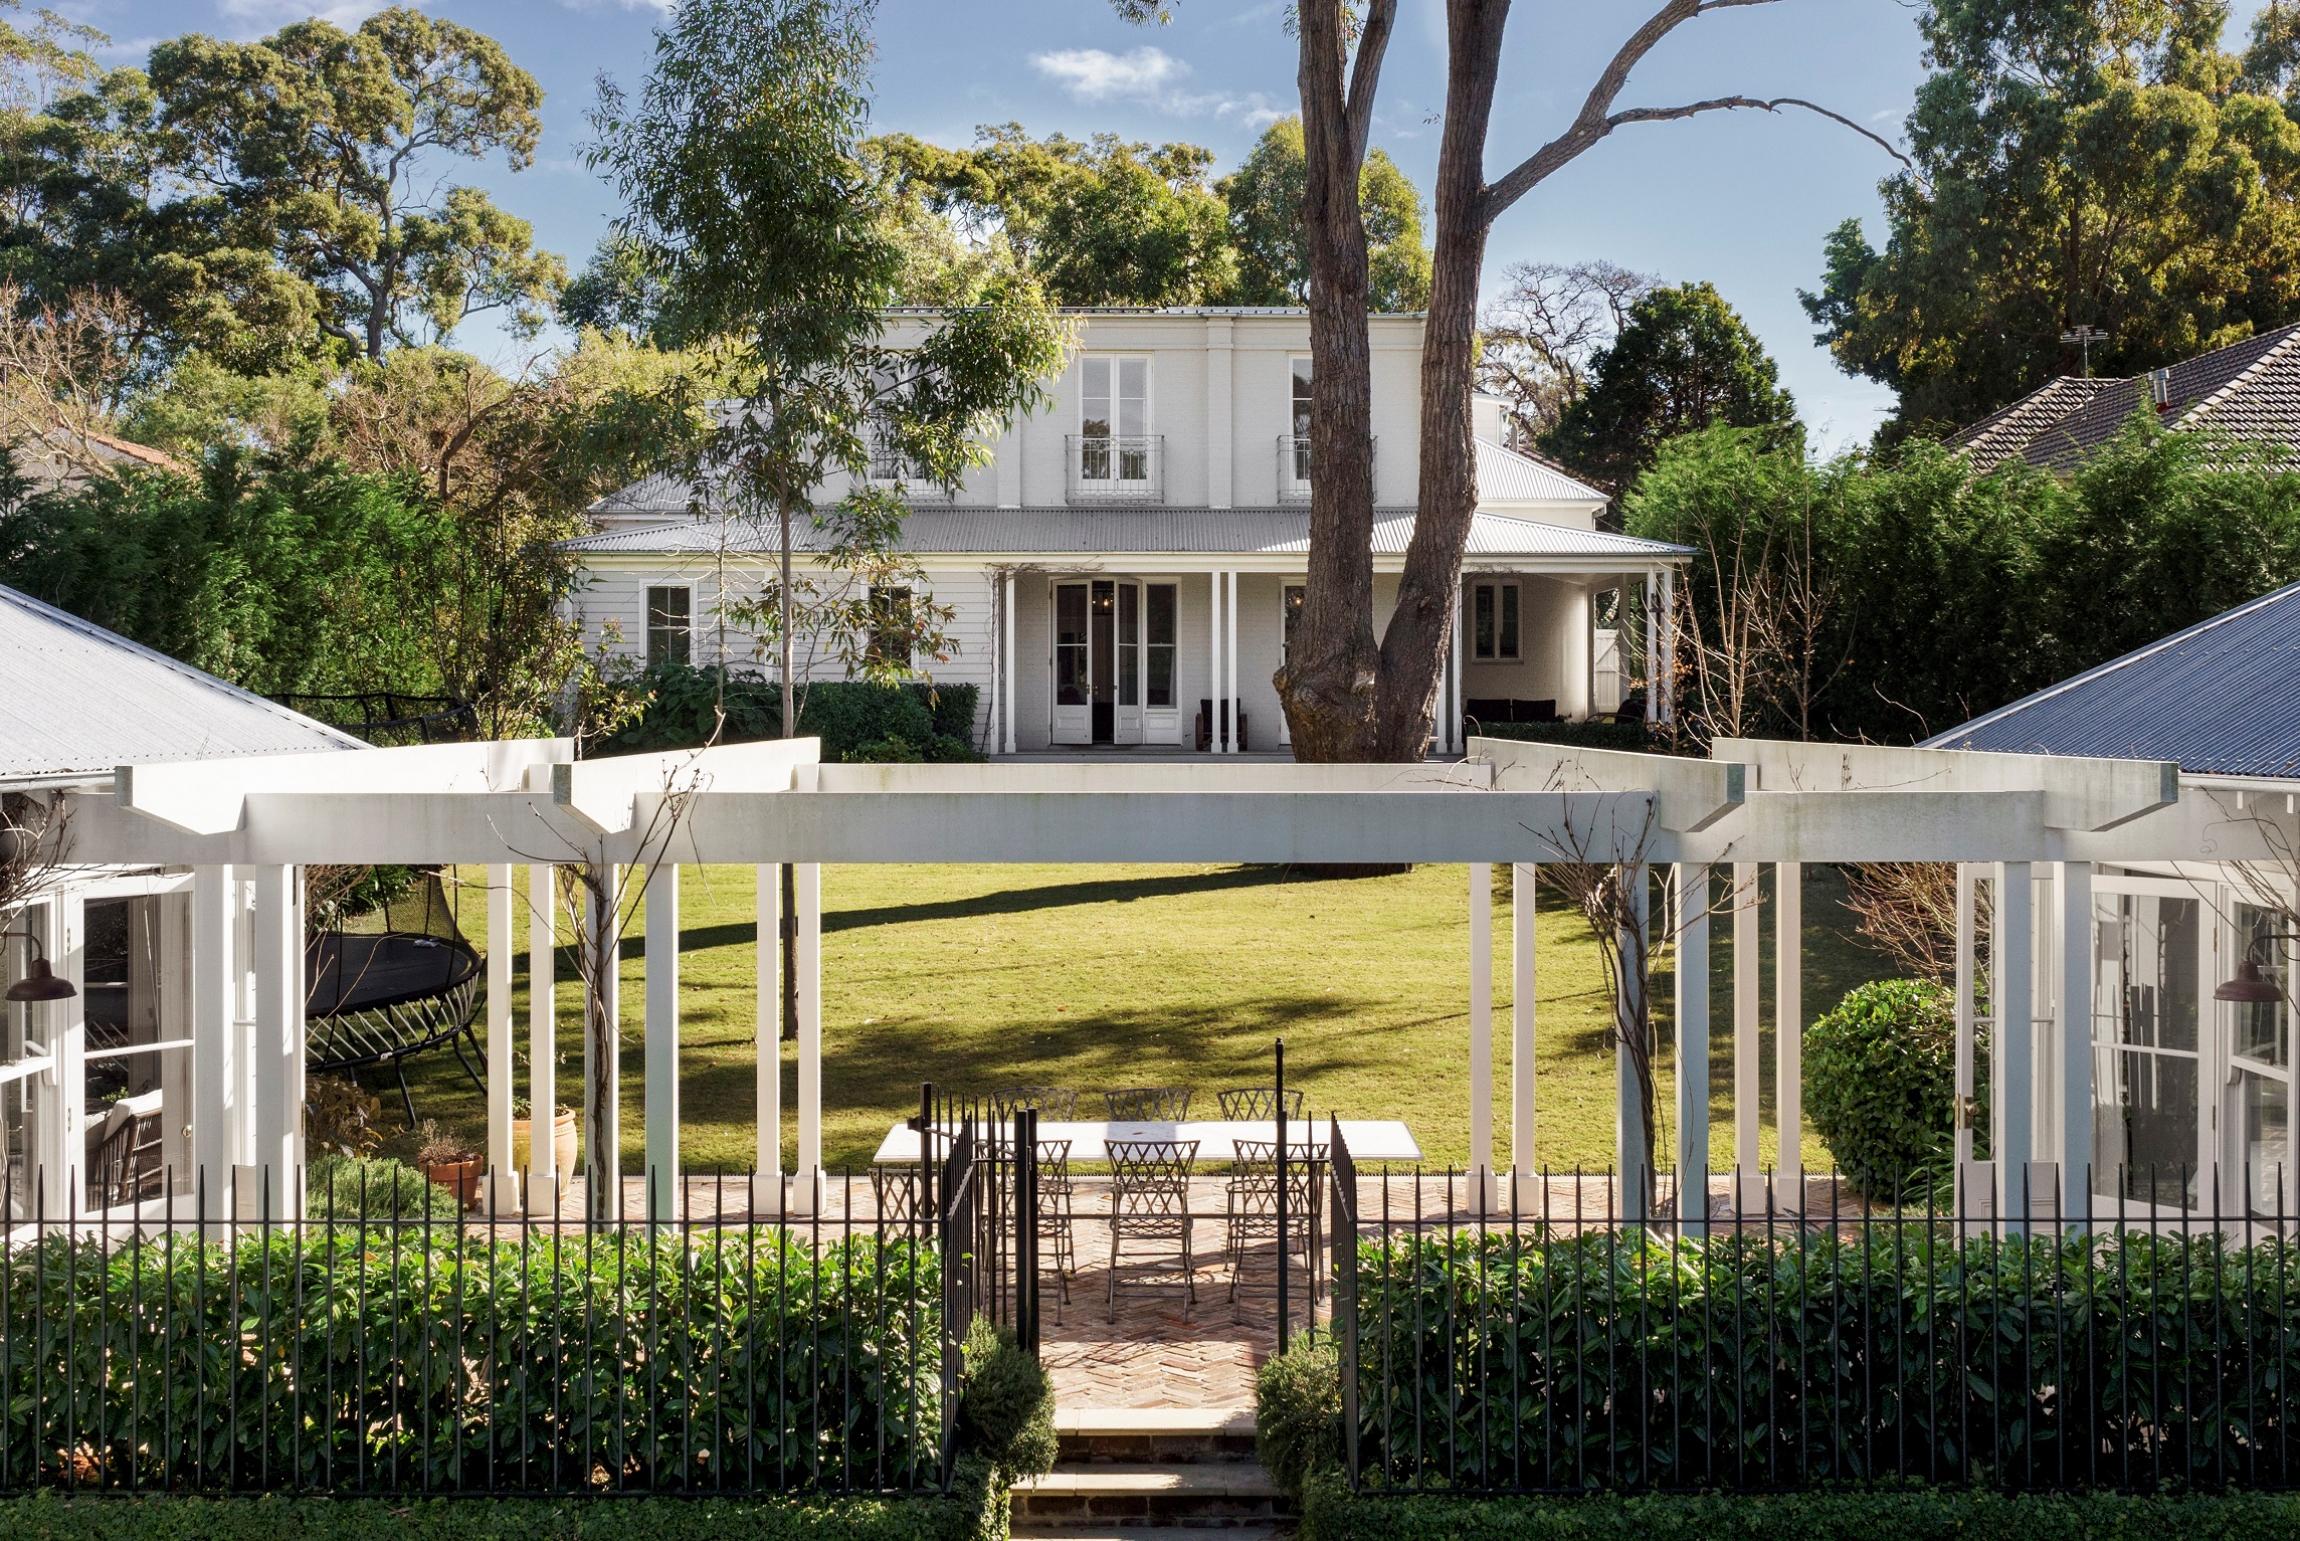 100-Year-Old-Heritage-Home-Restoration-Garden-Alfresco-Michael-Bell-Architects-Sydney